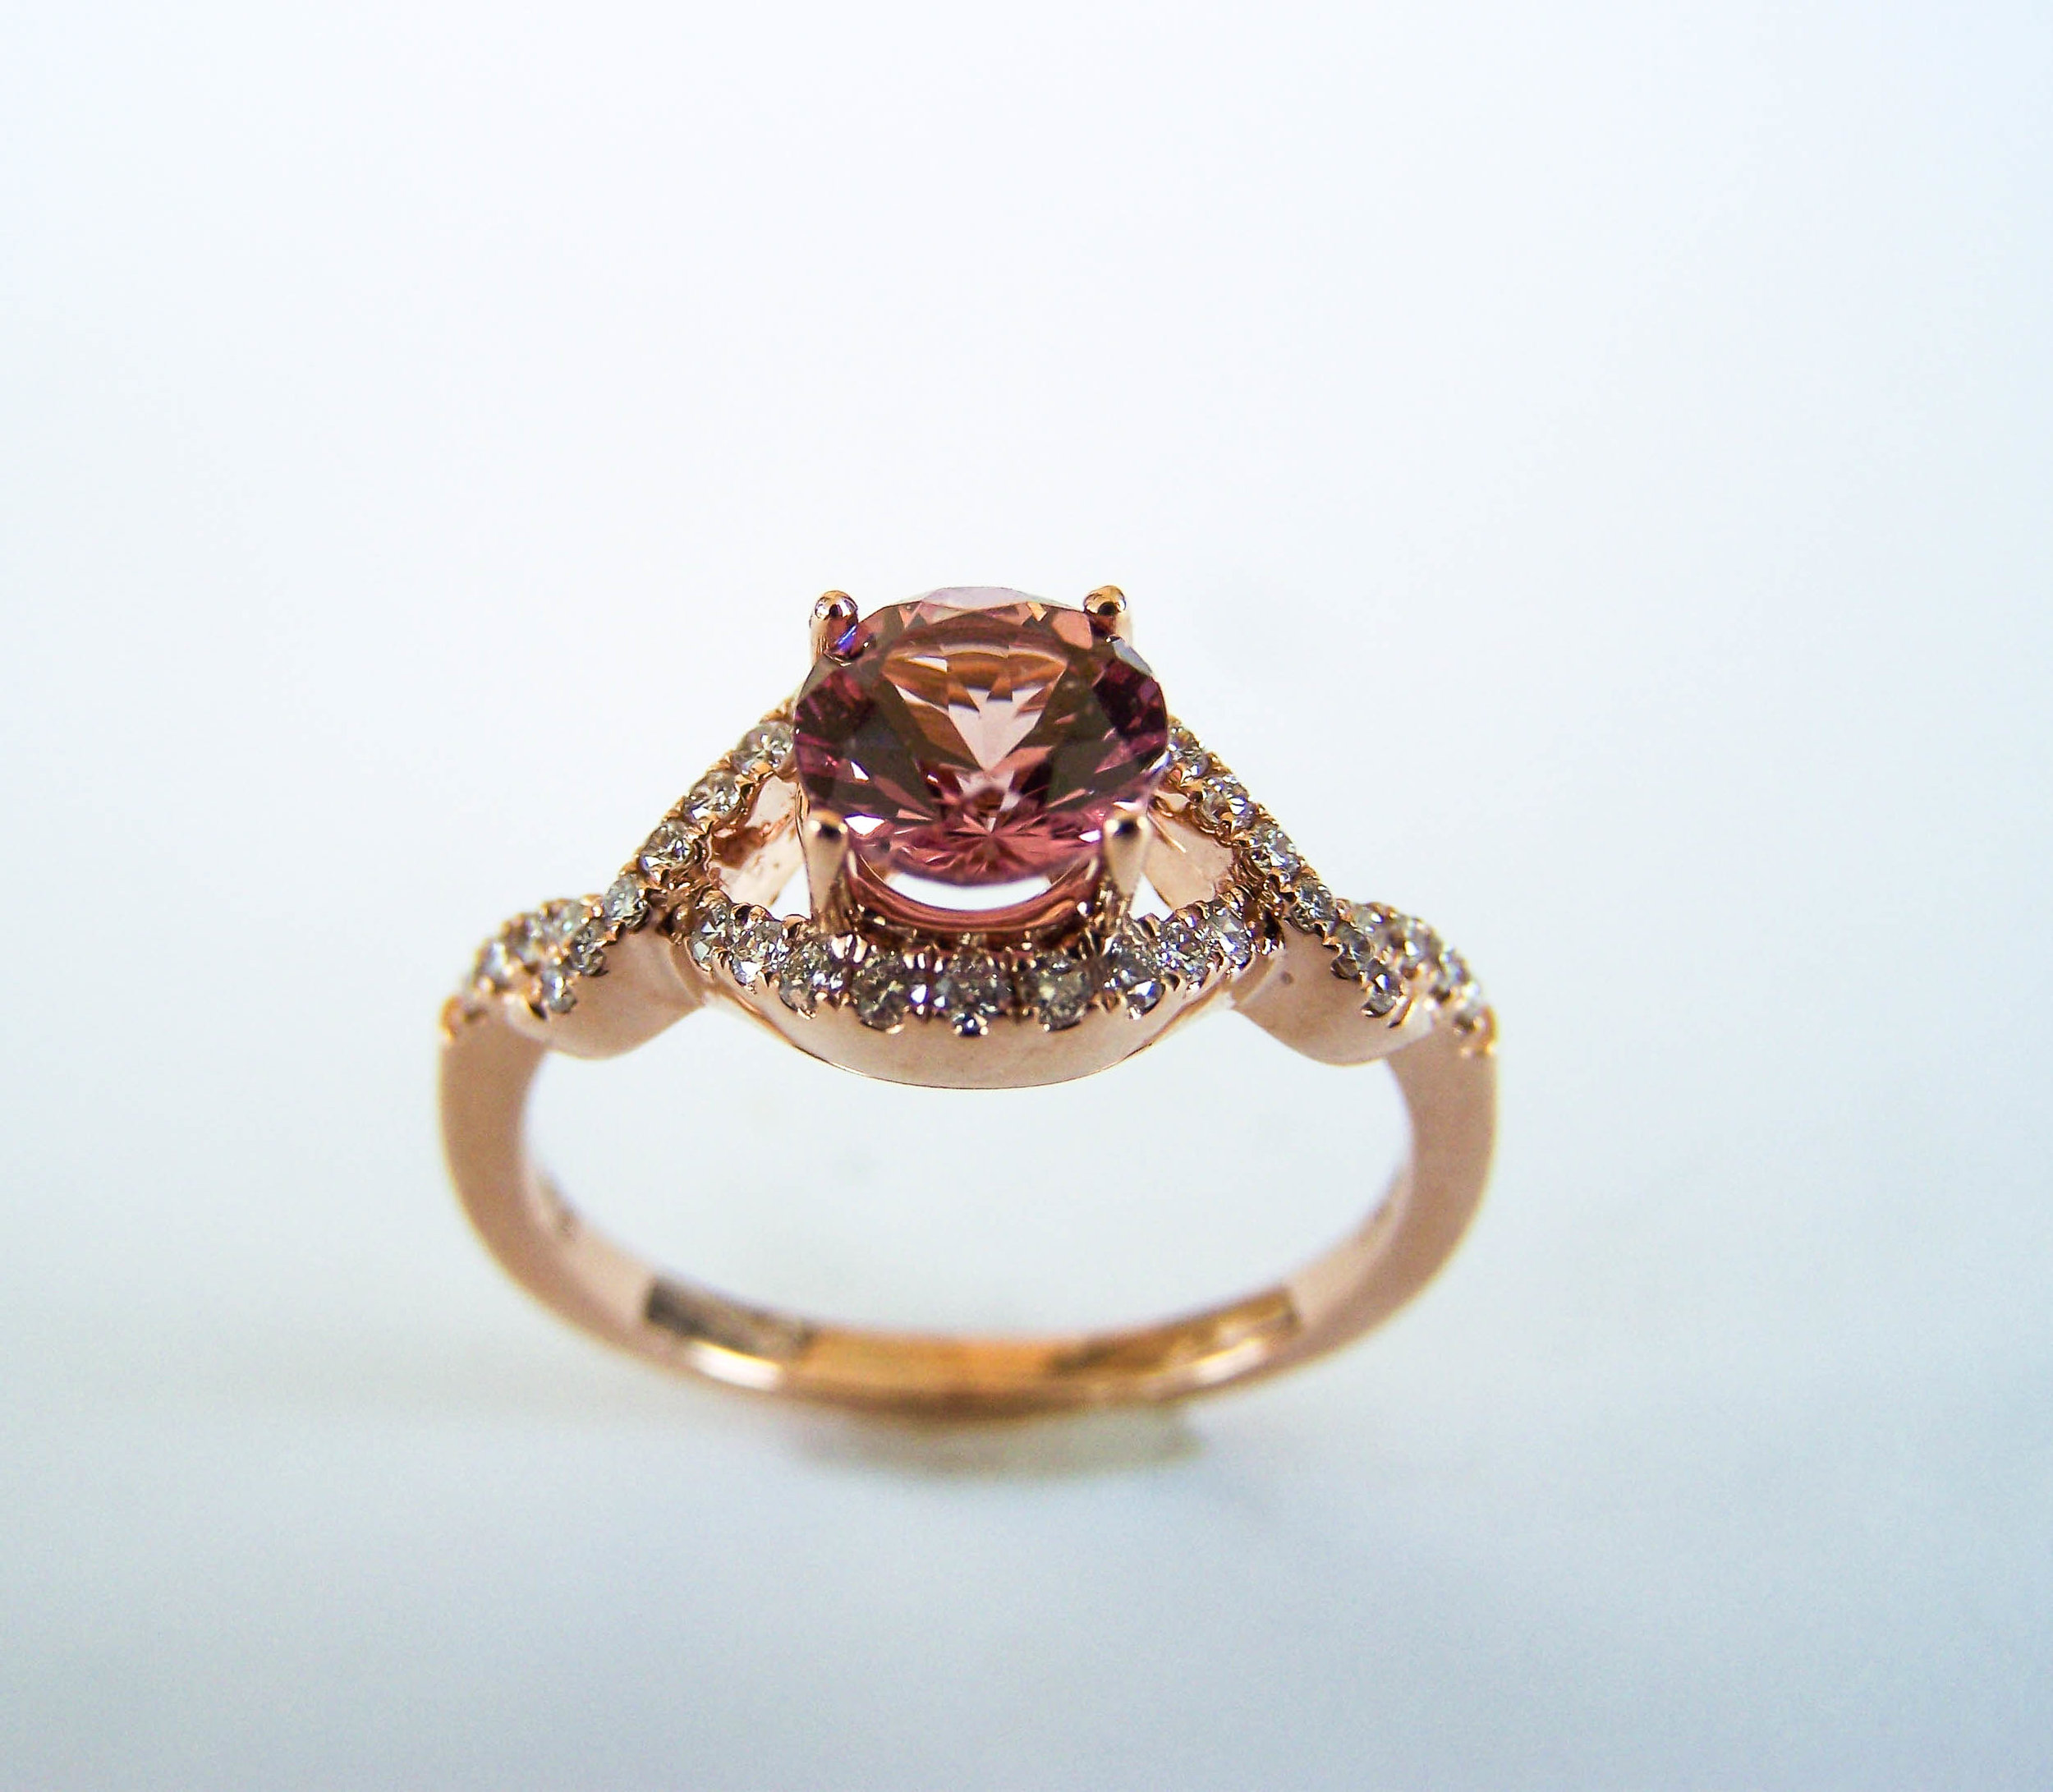 200-711  14 Karat Rosé Gold Fashion Ring with One 0.94 Carat Round Lotus Garnet and 0.21tw Round Diamonds $1,790.00